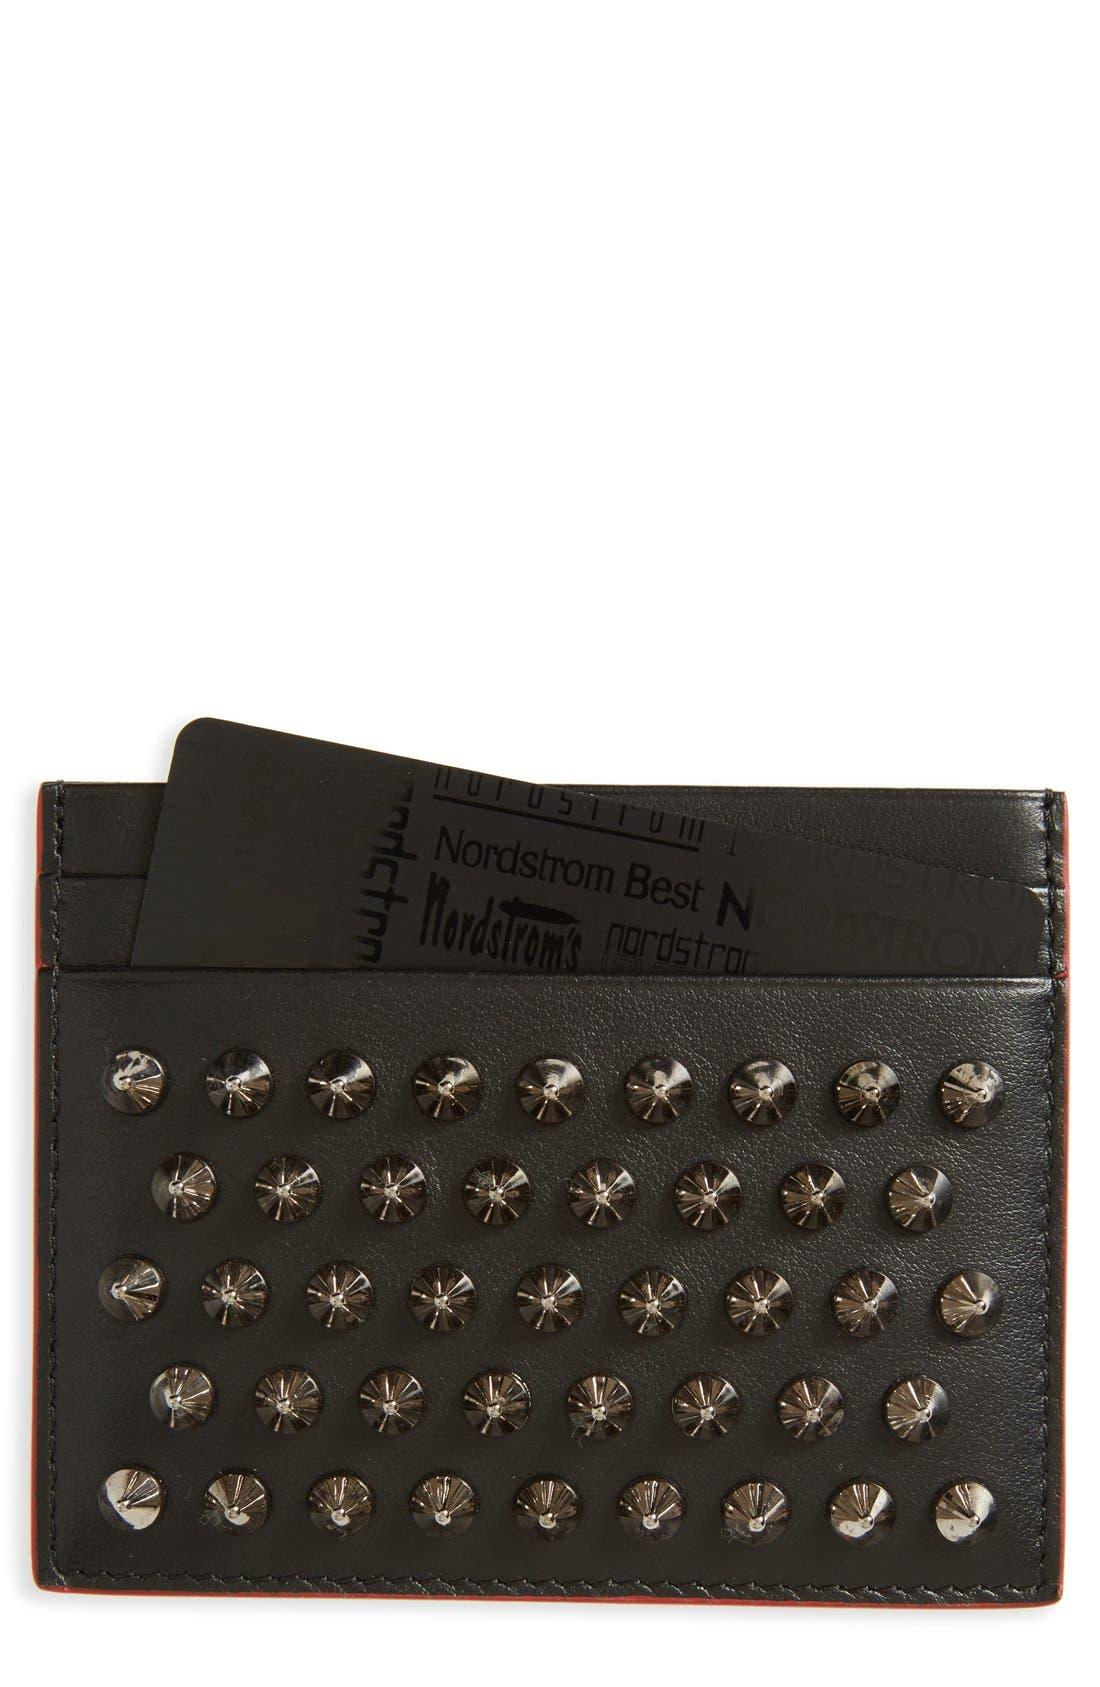 'Kios' Spiked Calfskin Leather Card Case,                         Main,                         color, Black/ Gunmetal